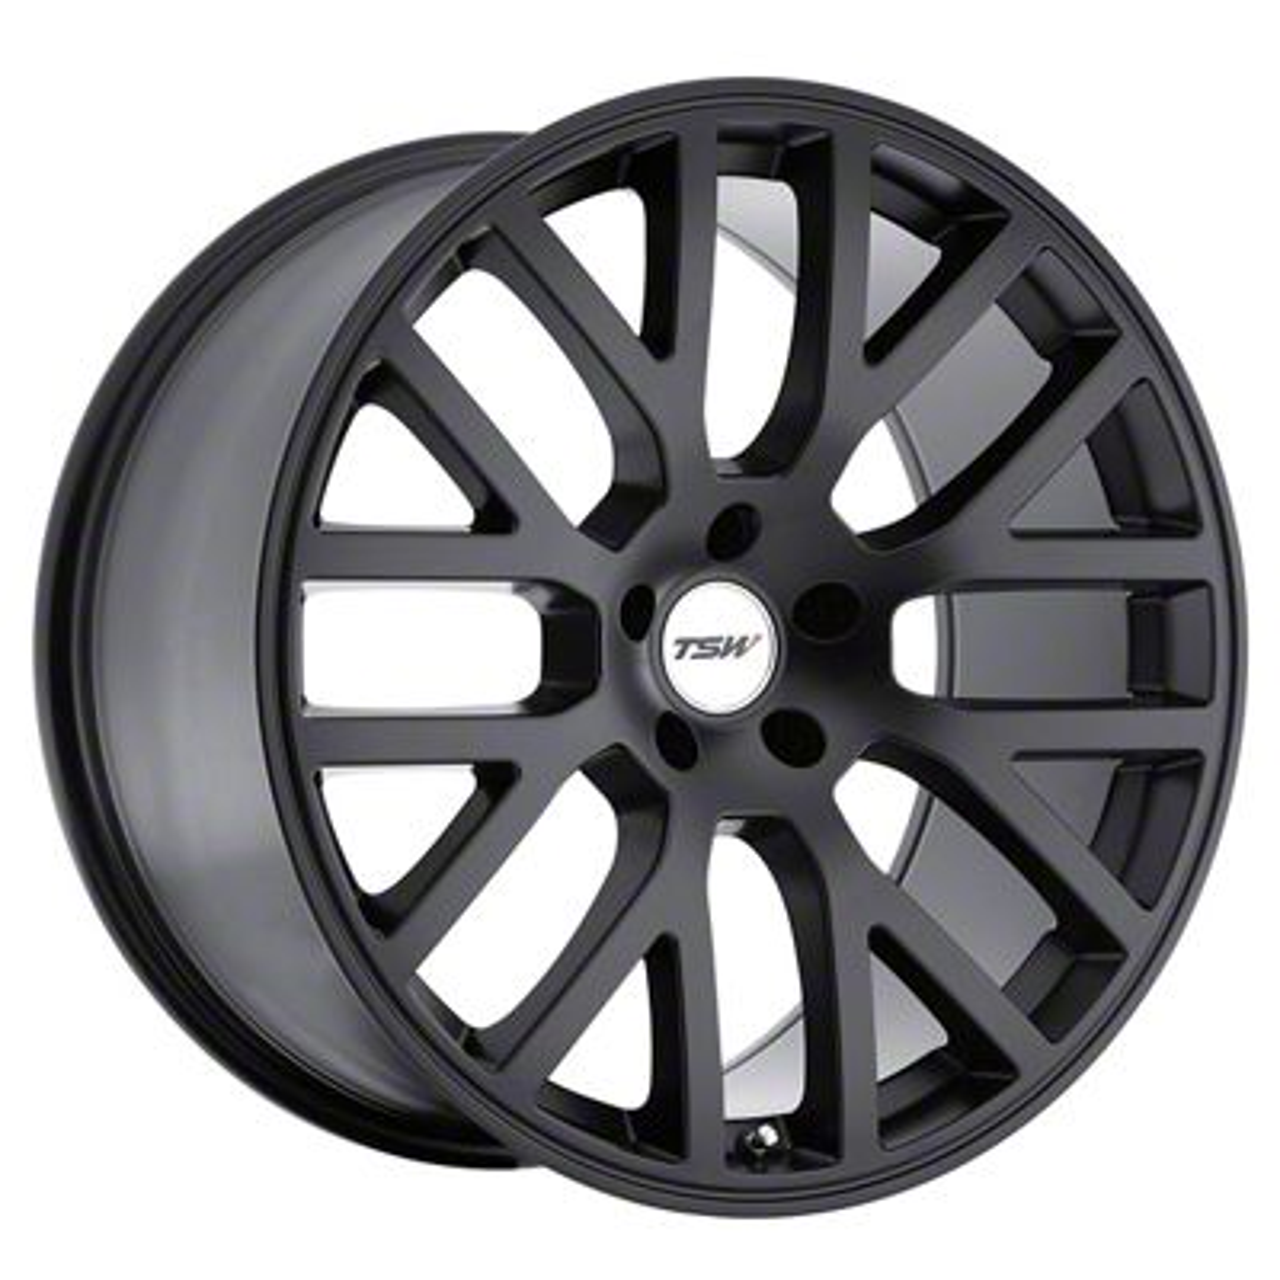 TSW Donington Matte Black Wheel - 20x10 - Rear Only (15-19 GT, EcoBoost, V6)